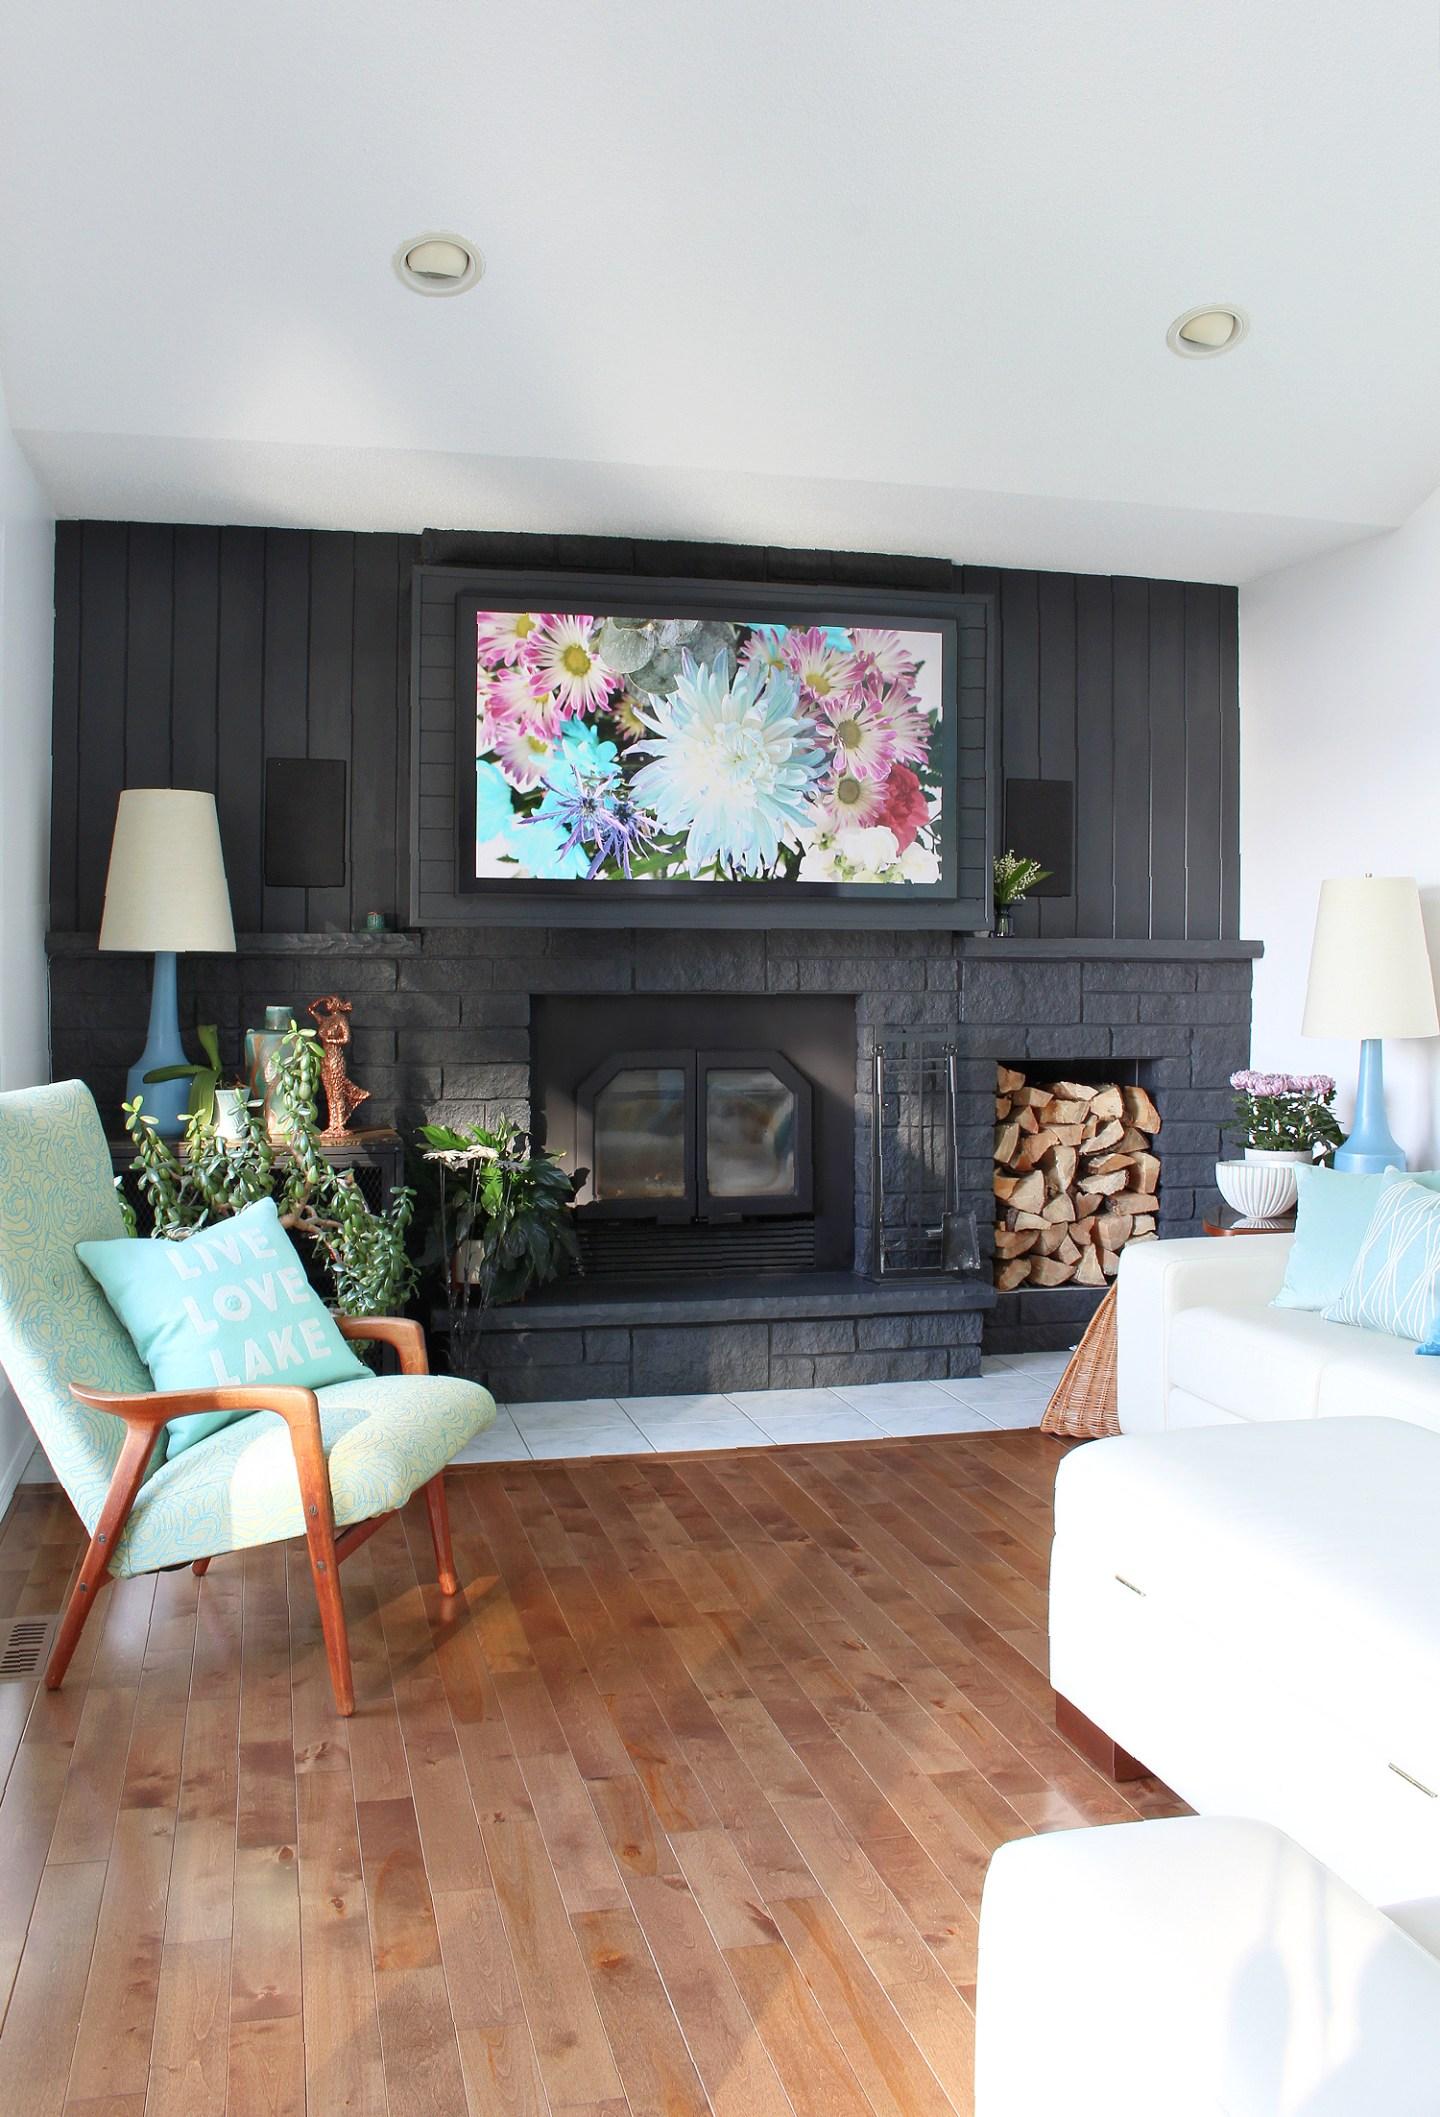 Lake House Fireplace Below a TV